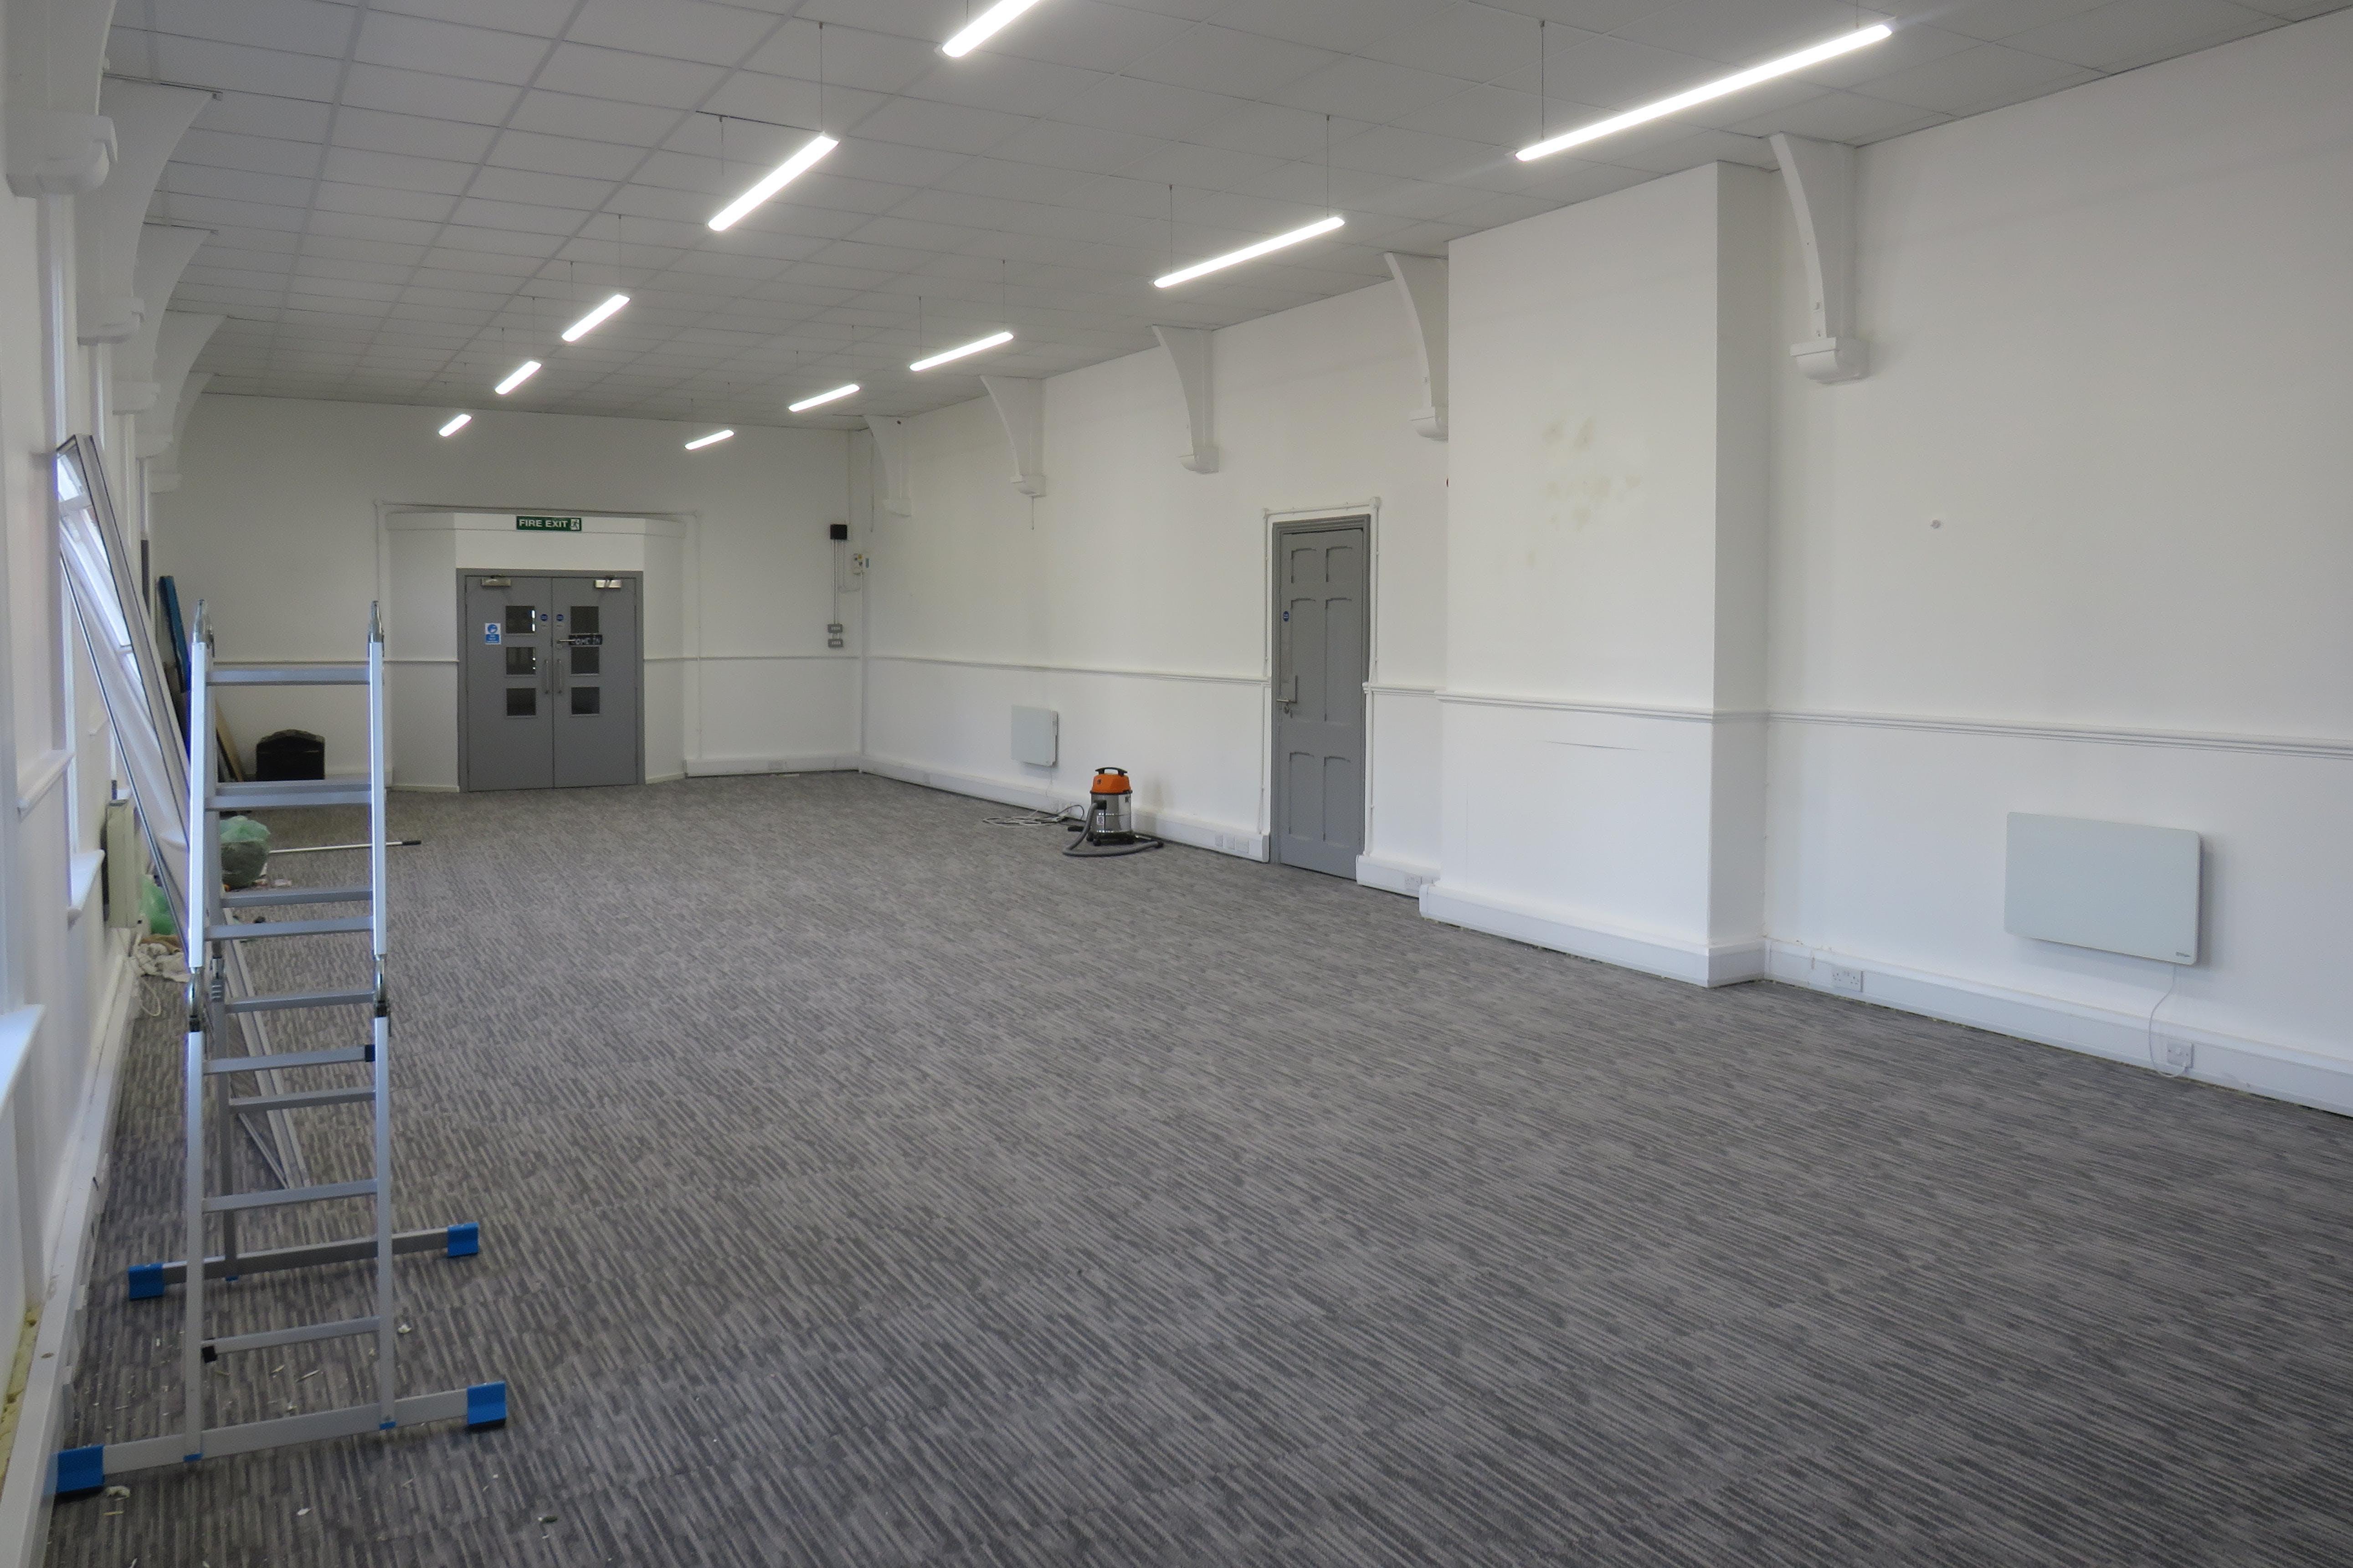 Suite 1, Studio 40, 40 Lynchford Road, Farnborough, Offices To Let - IMG_0531.JPG